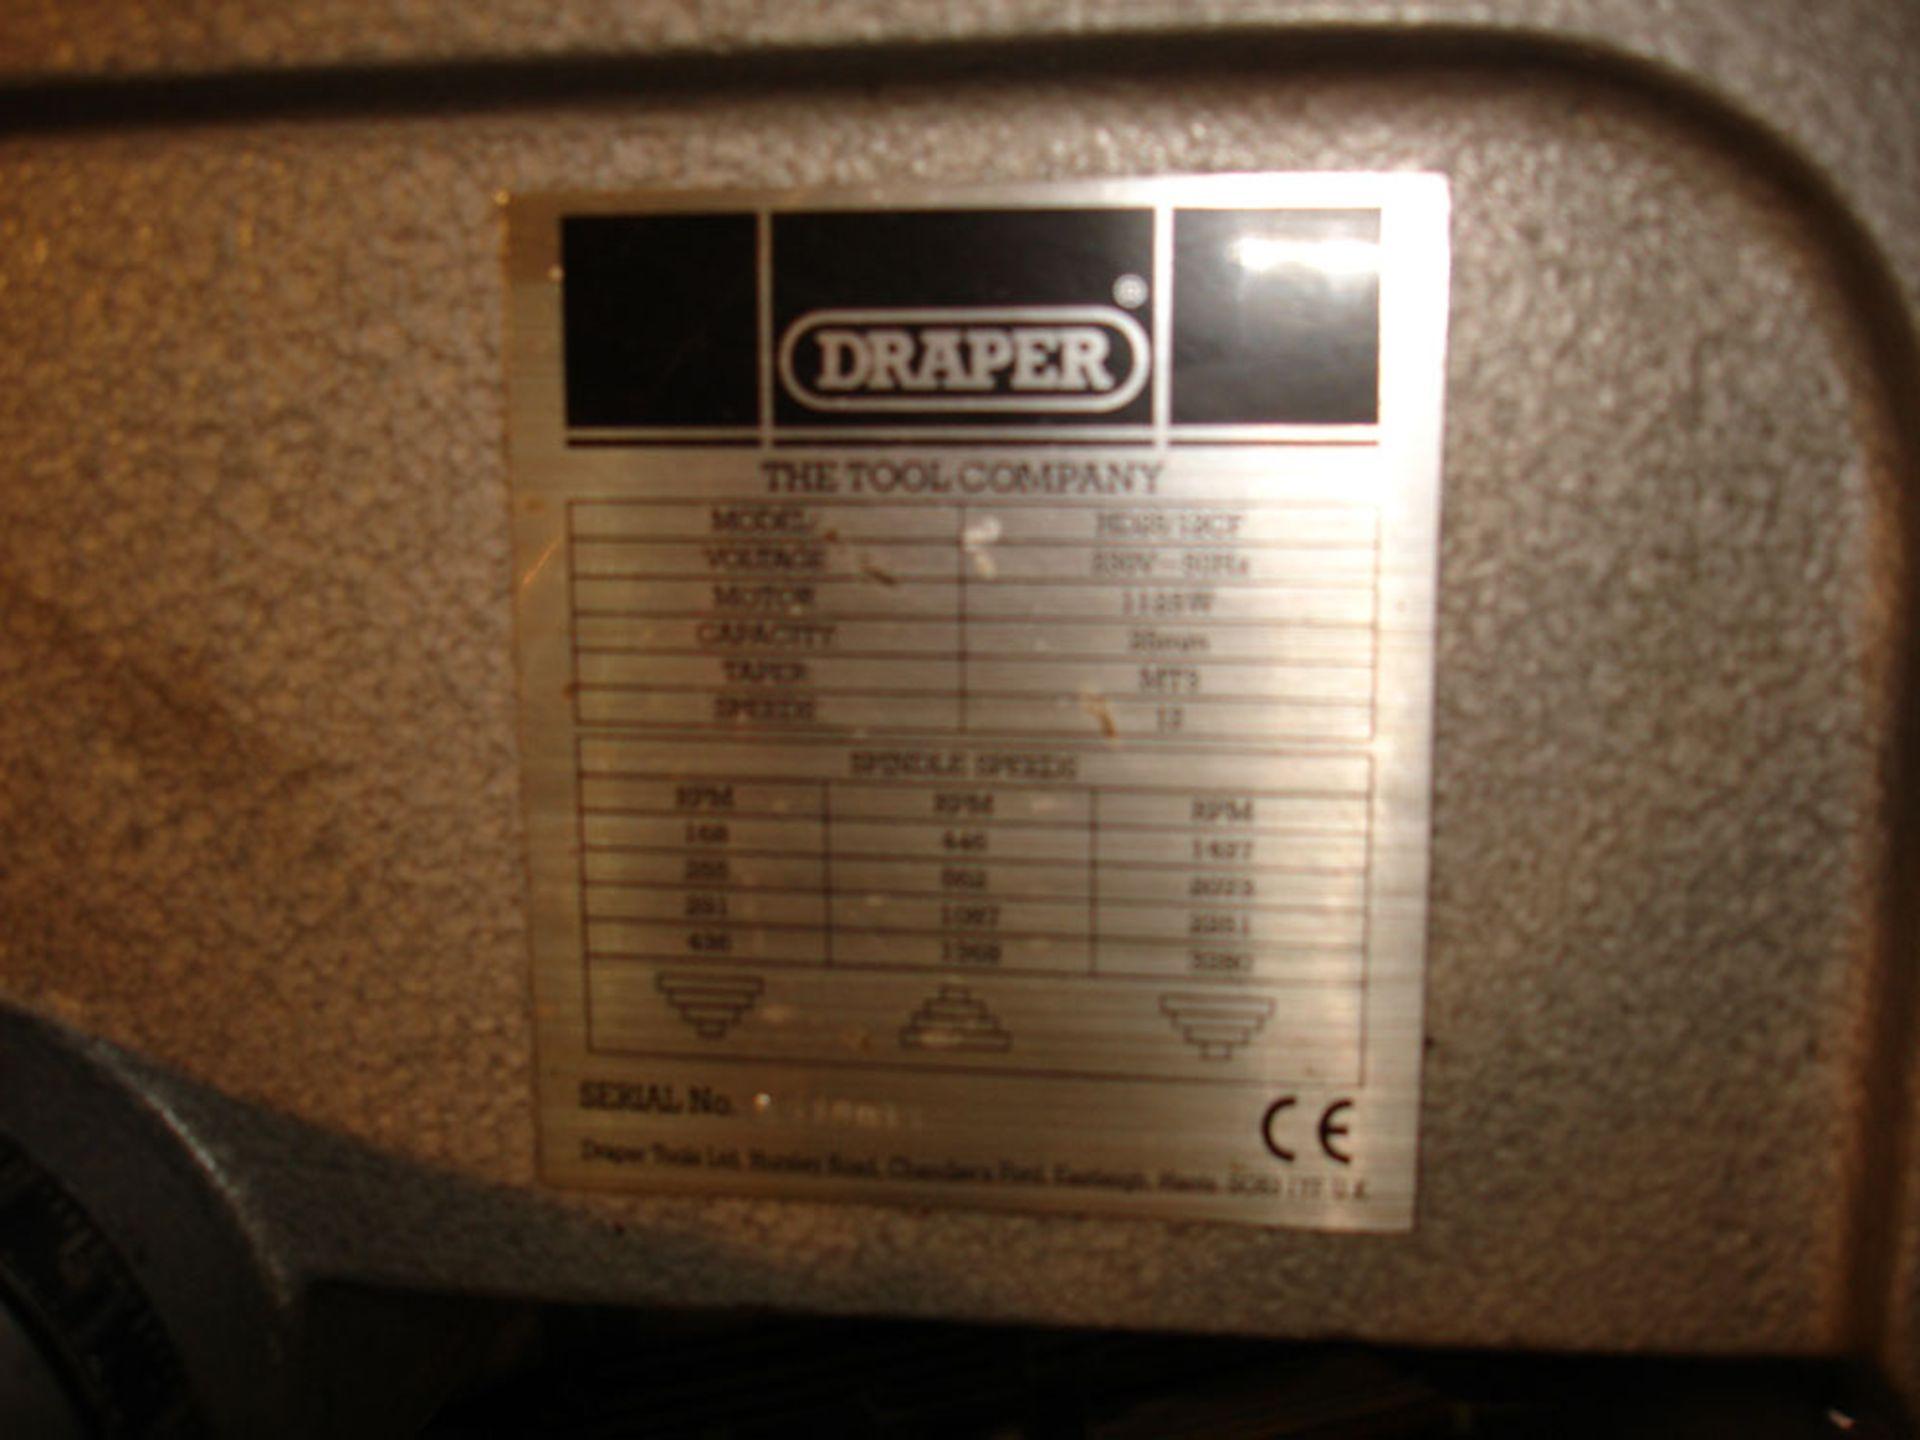 Draper Pillar Drill. Capacity 25 mm. 3 Morse Taper. - Image 5 of 5